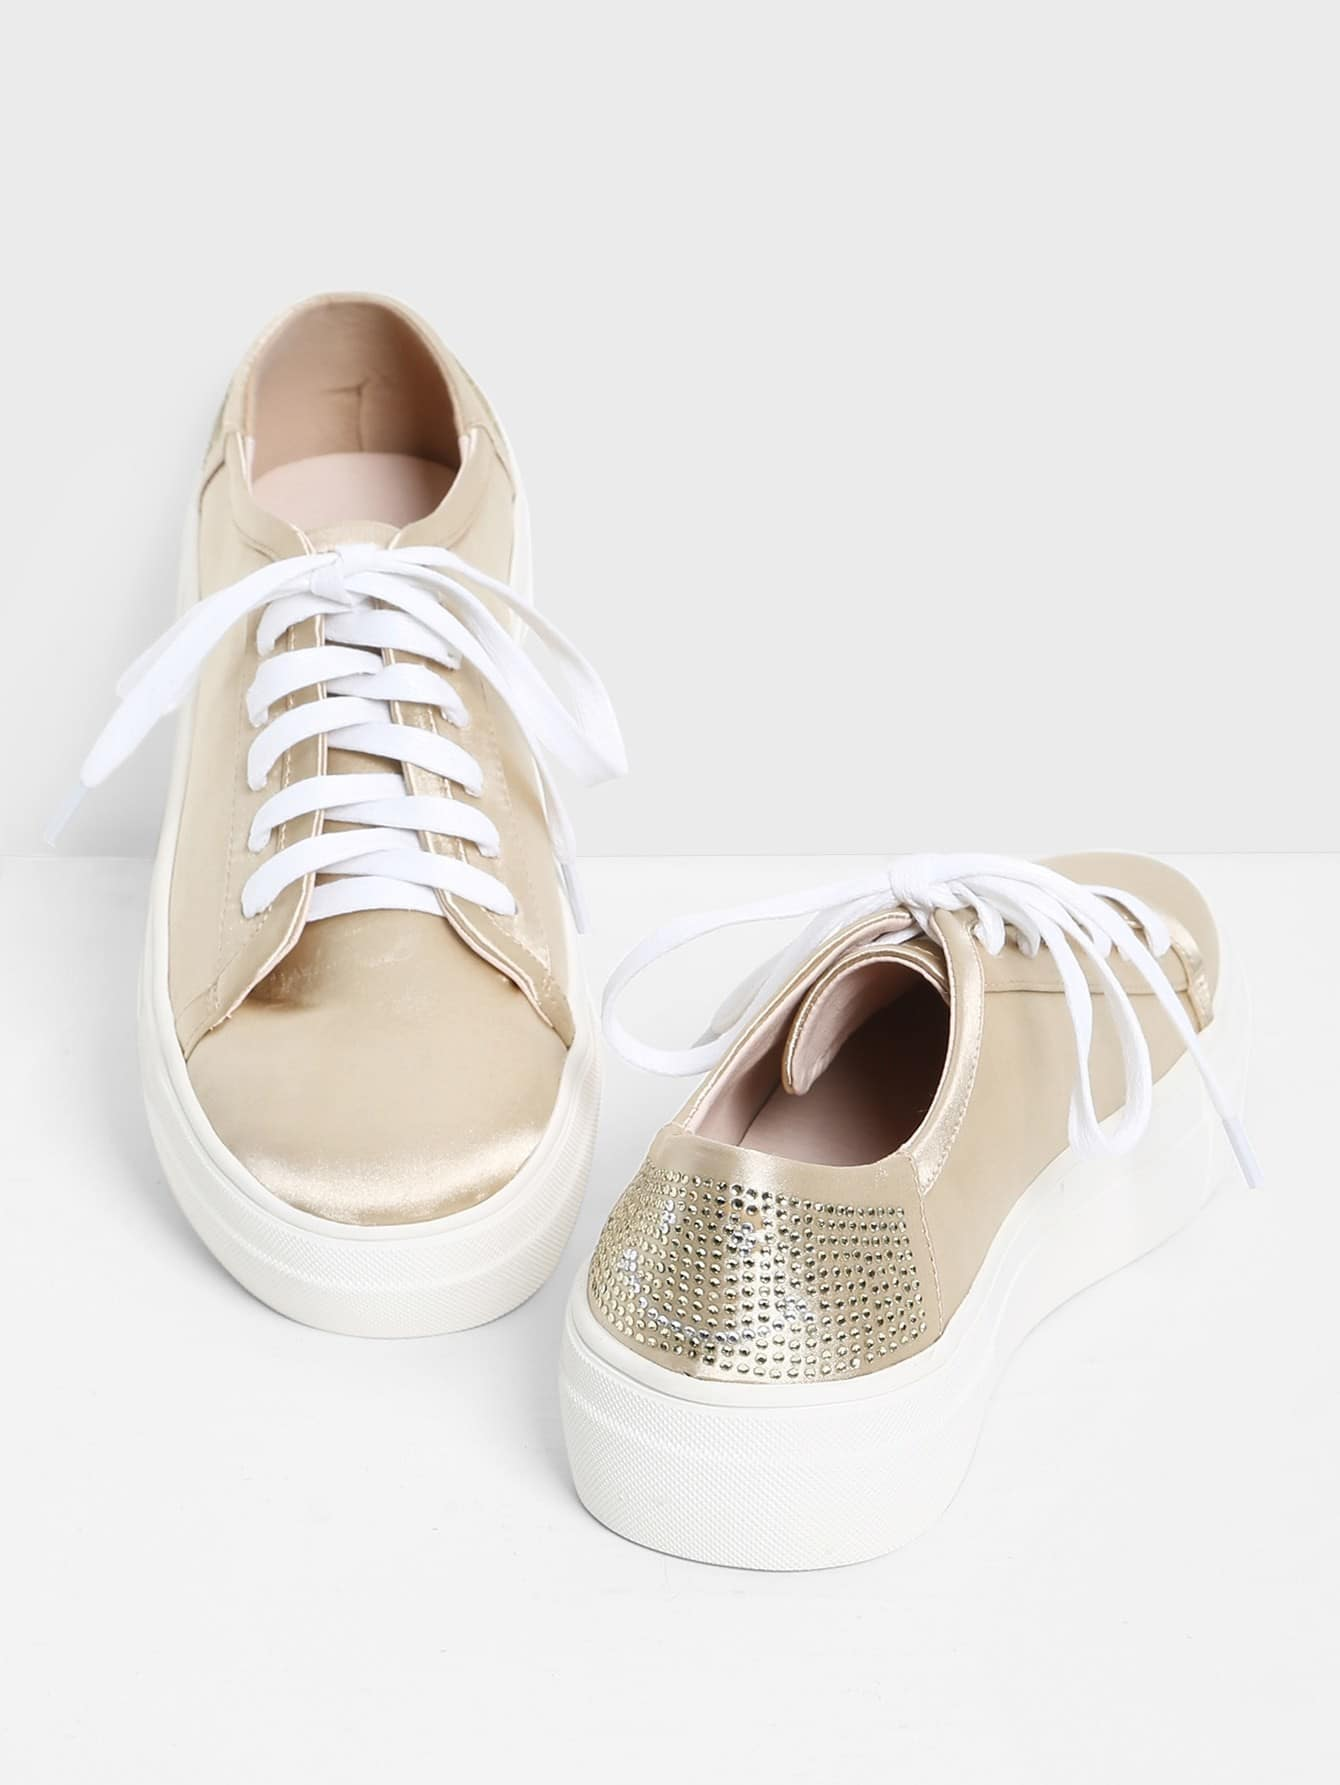 Rhinestone Detail Lace Up PU Sneakers